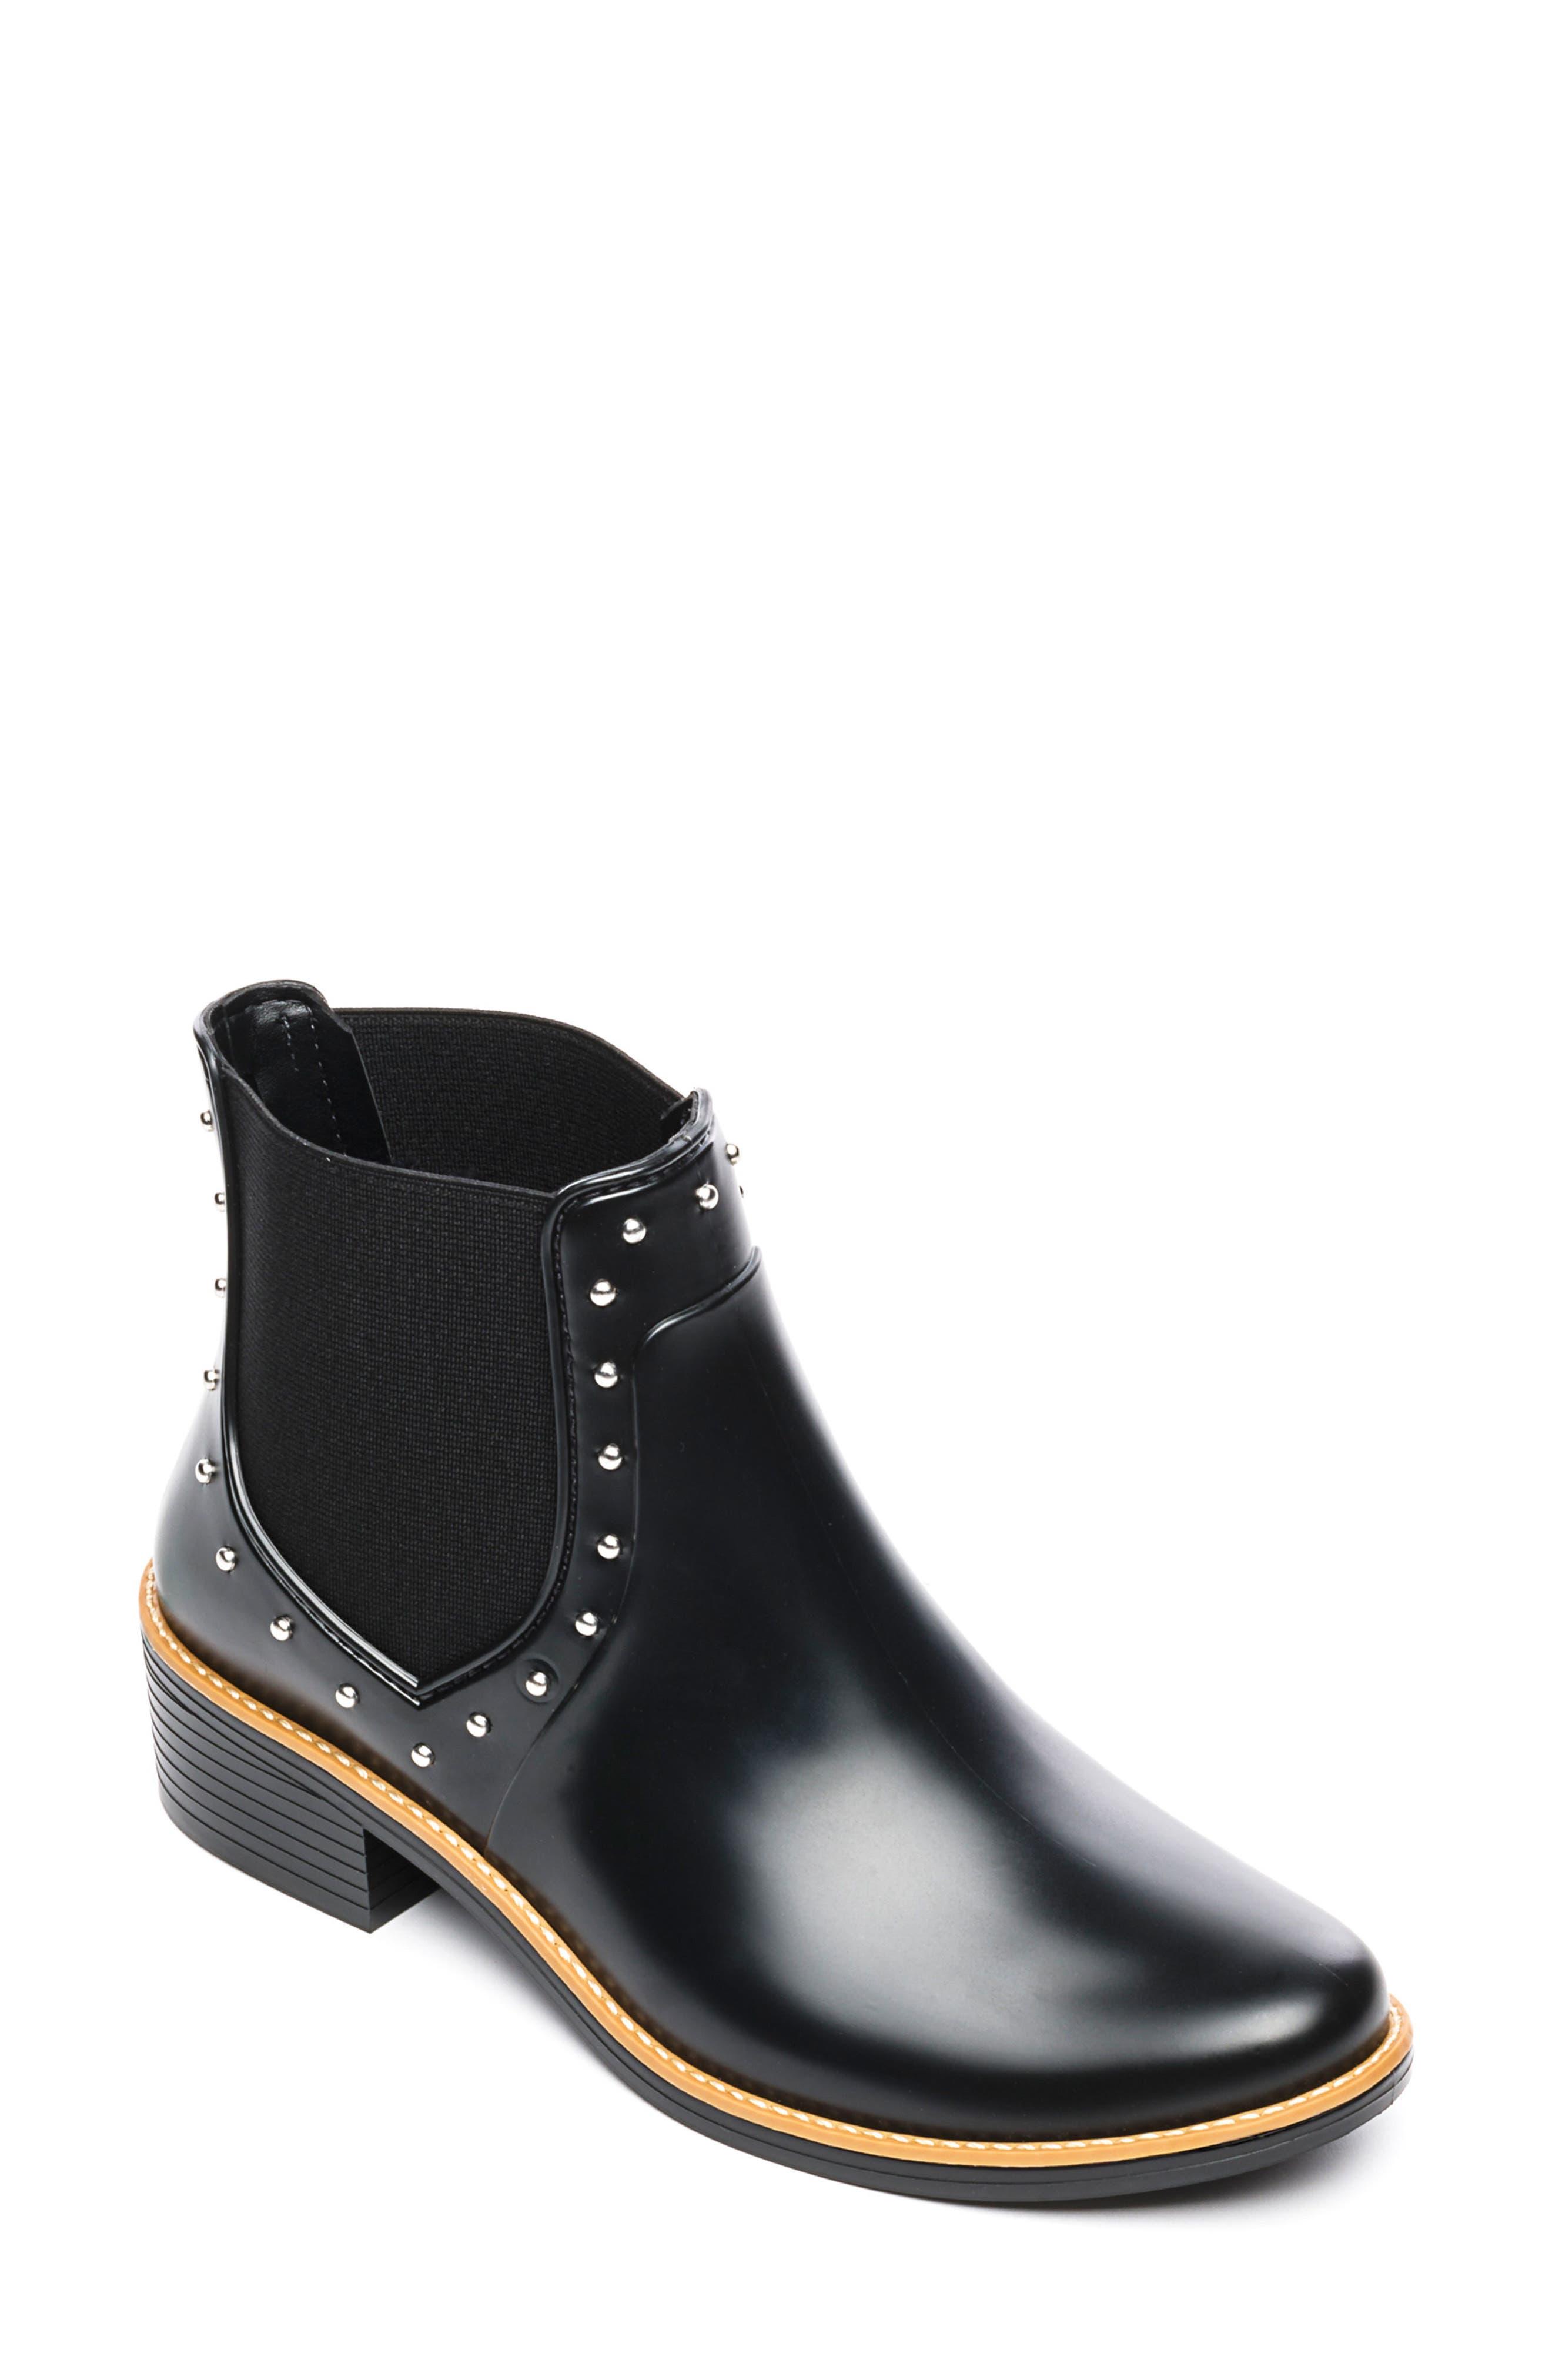 BERNARDO Peyton Waterproof Rain Bootie, Main, color, BLACK